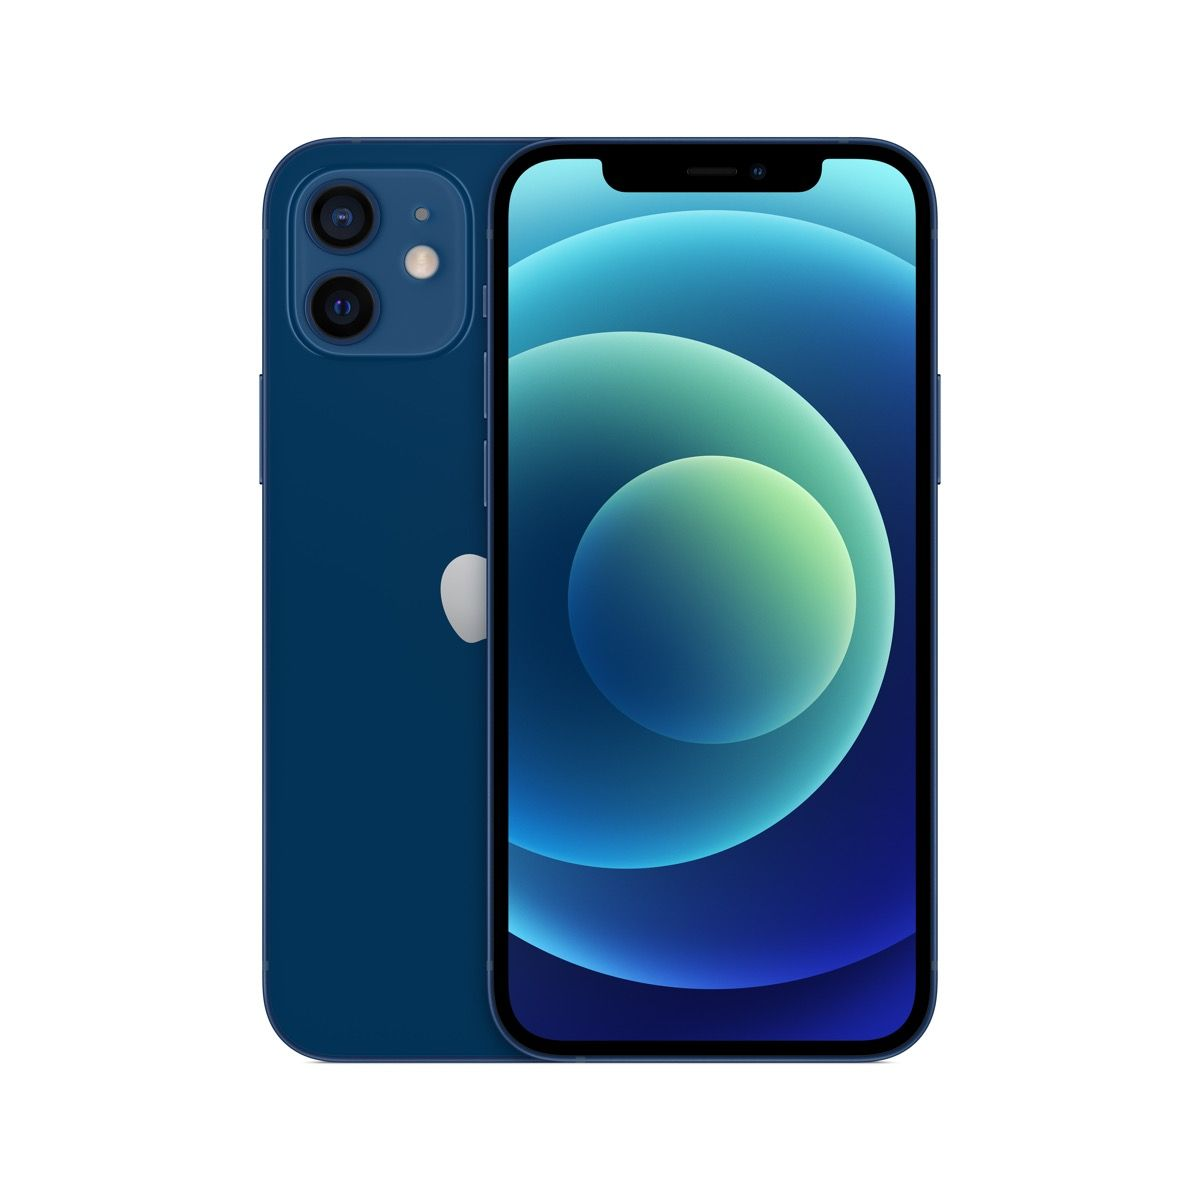 Apple iPhone 12 mini 256GB Blue / SK